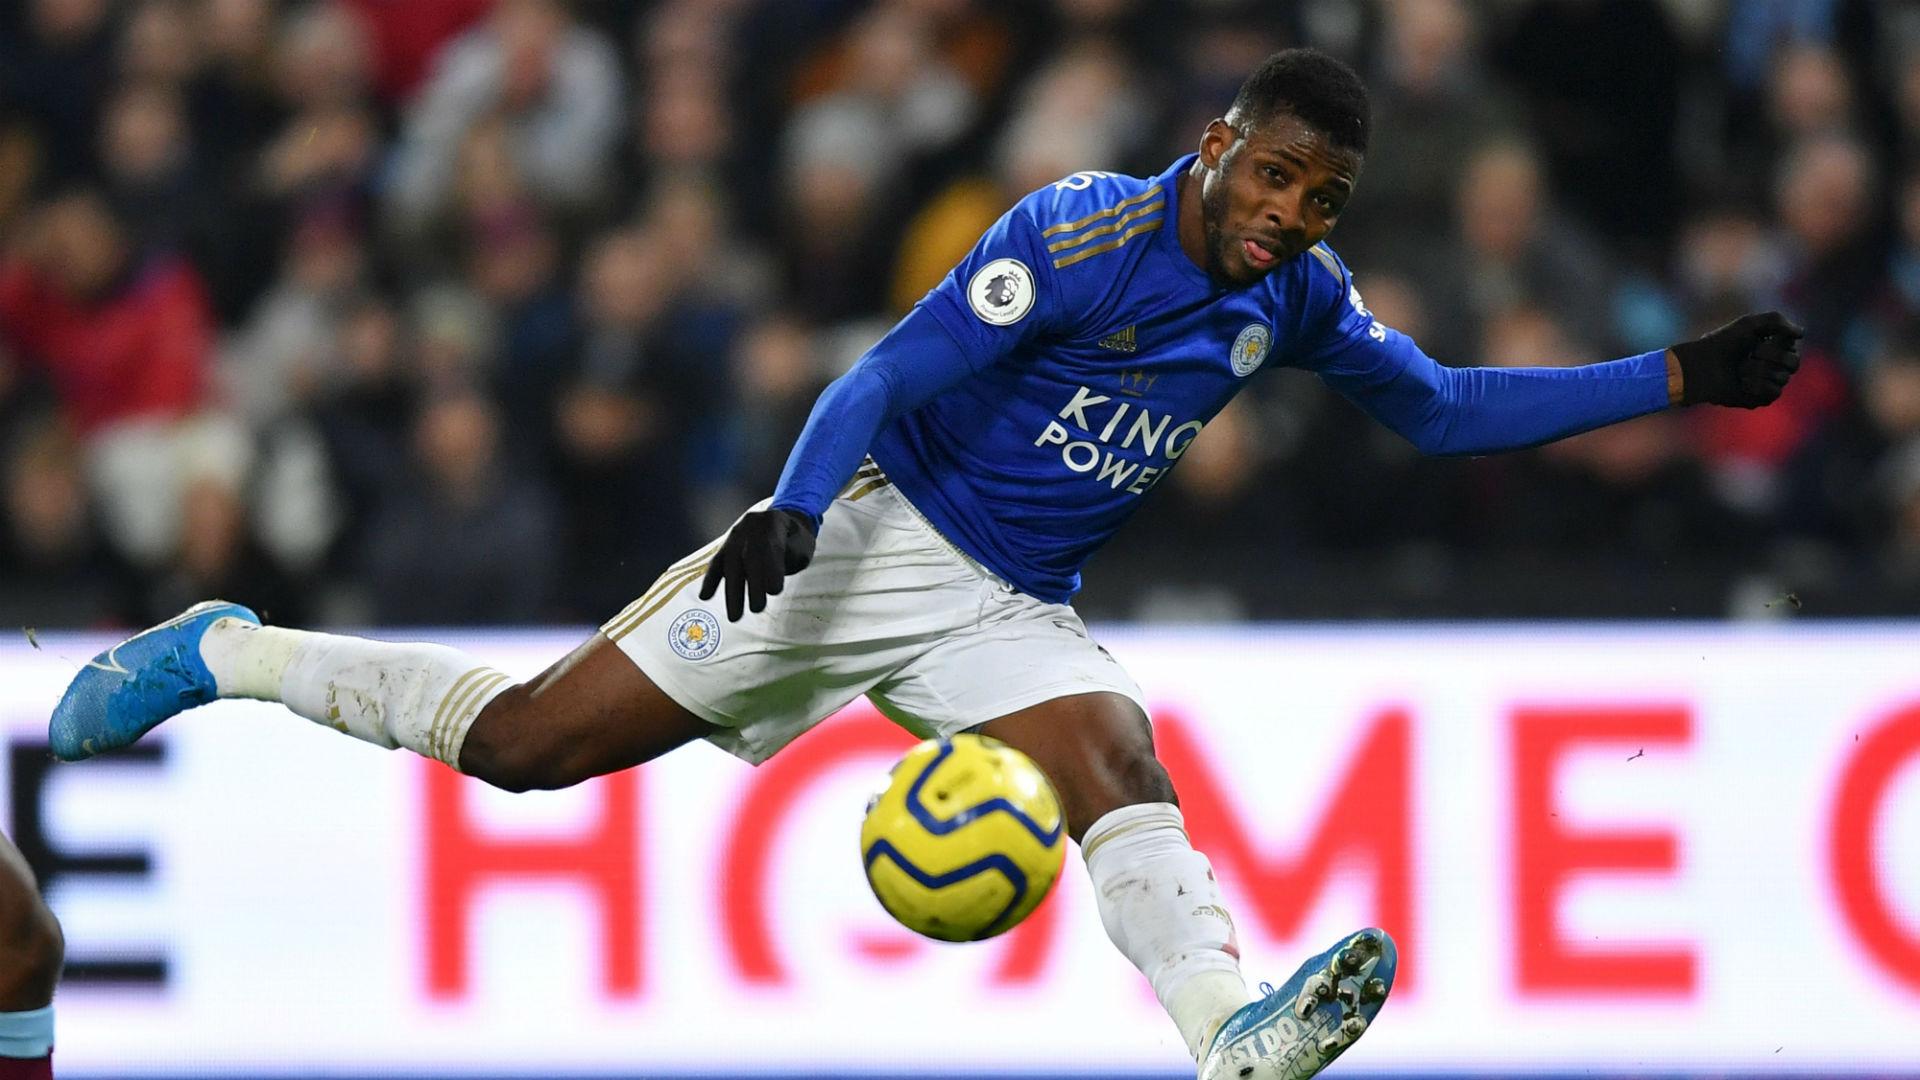 Kelechi Iheanacho - Leicester City